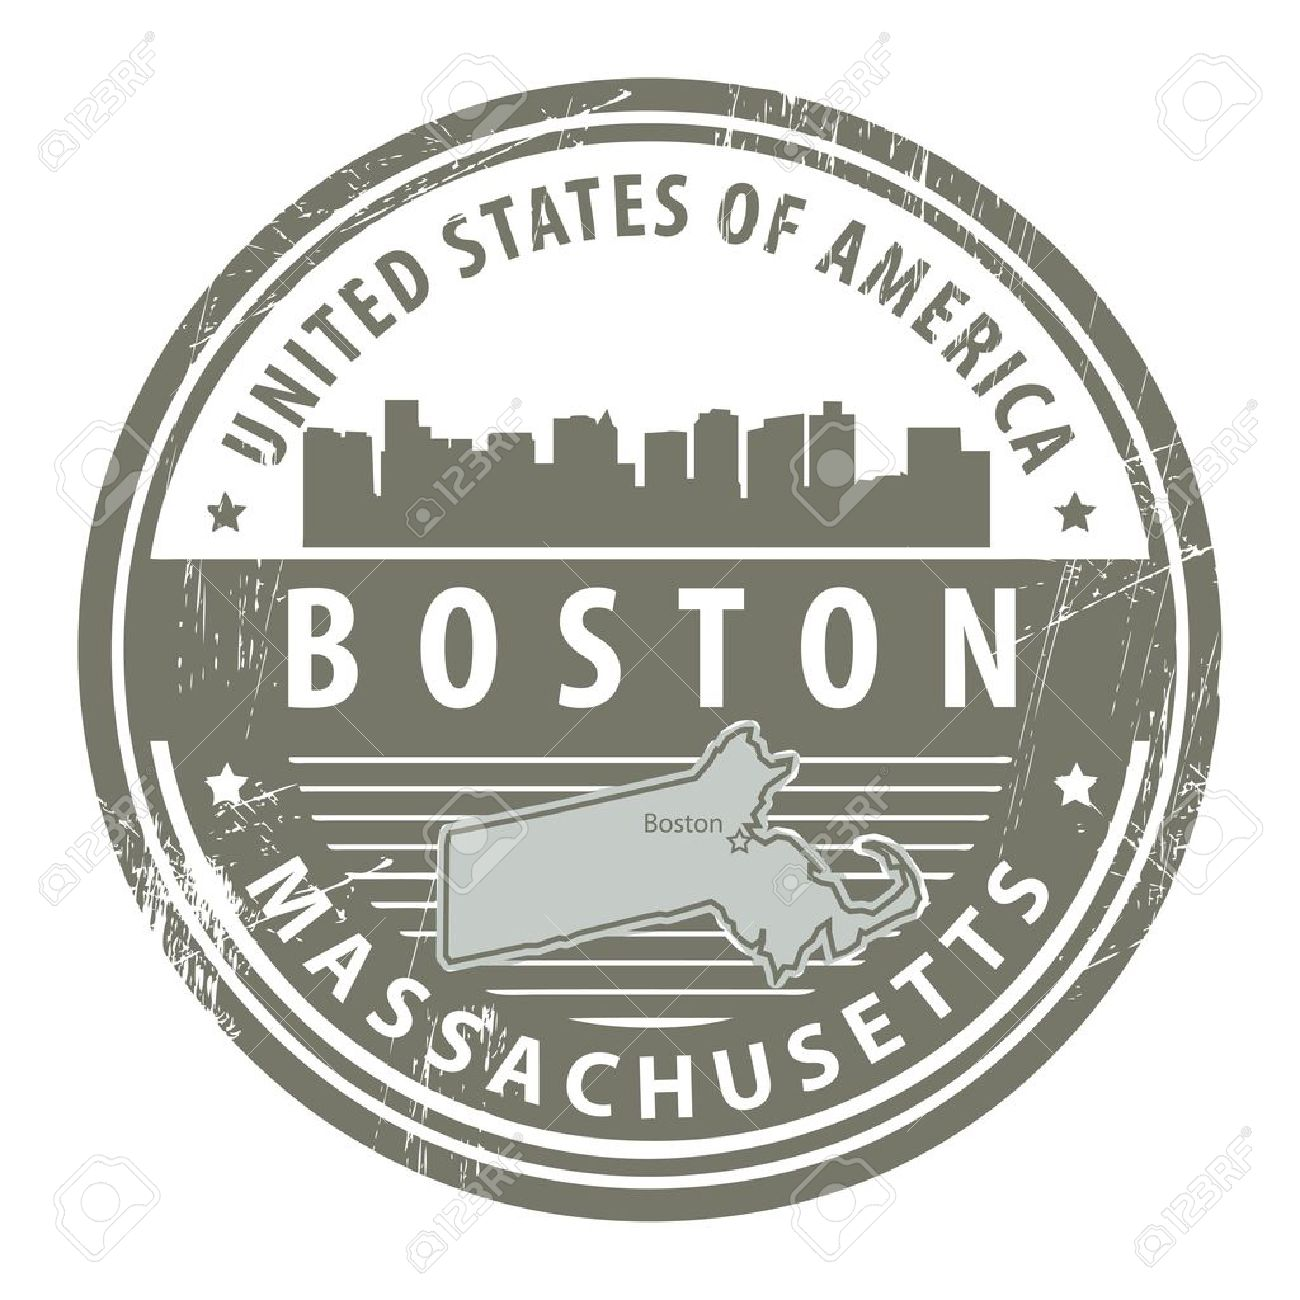 236 Boston Map Stock Vector Illustration And Royalty Free Boston.